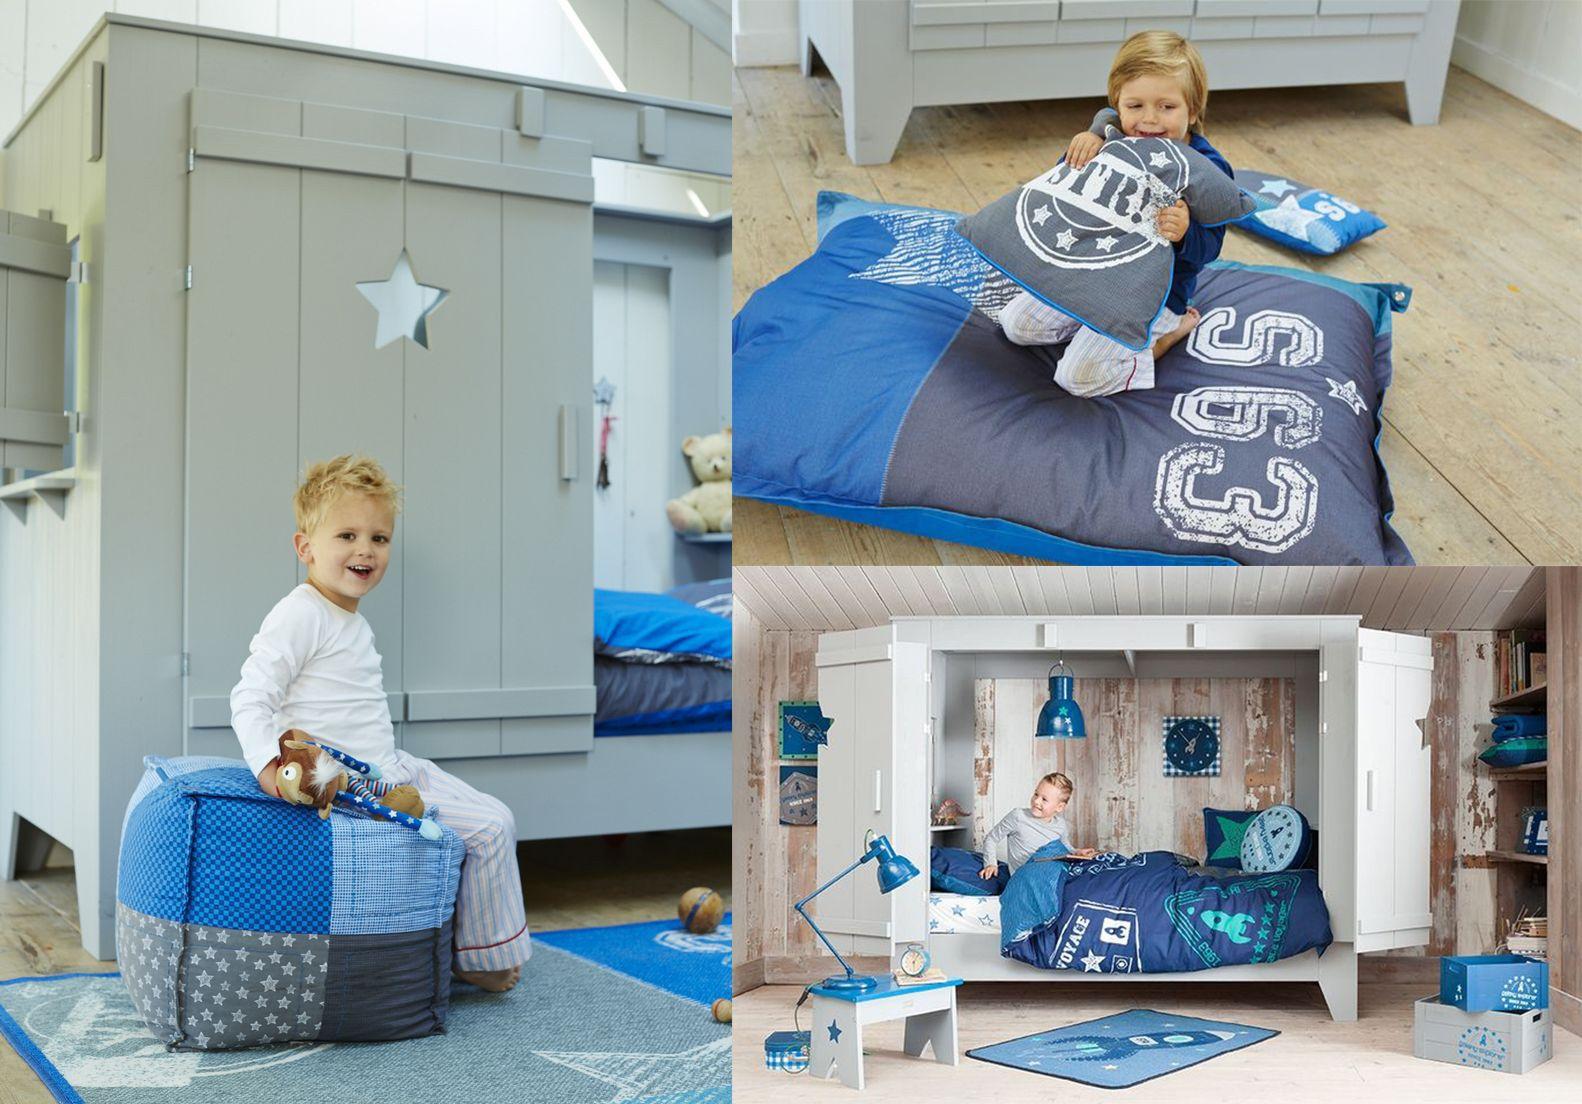 Kinderkamer Lief Lifestyle : Lief lifestyle collectie voor babykamer of kinderkamer ism leen